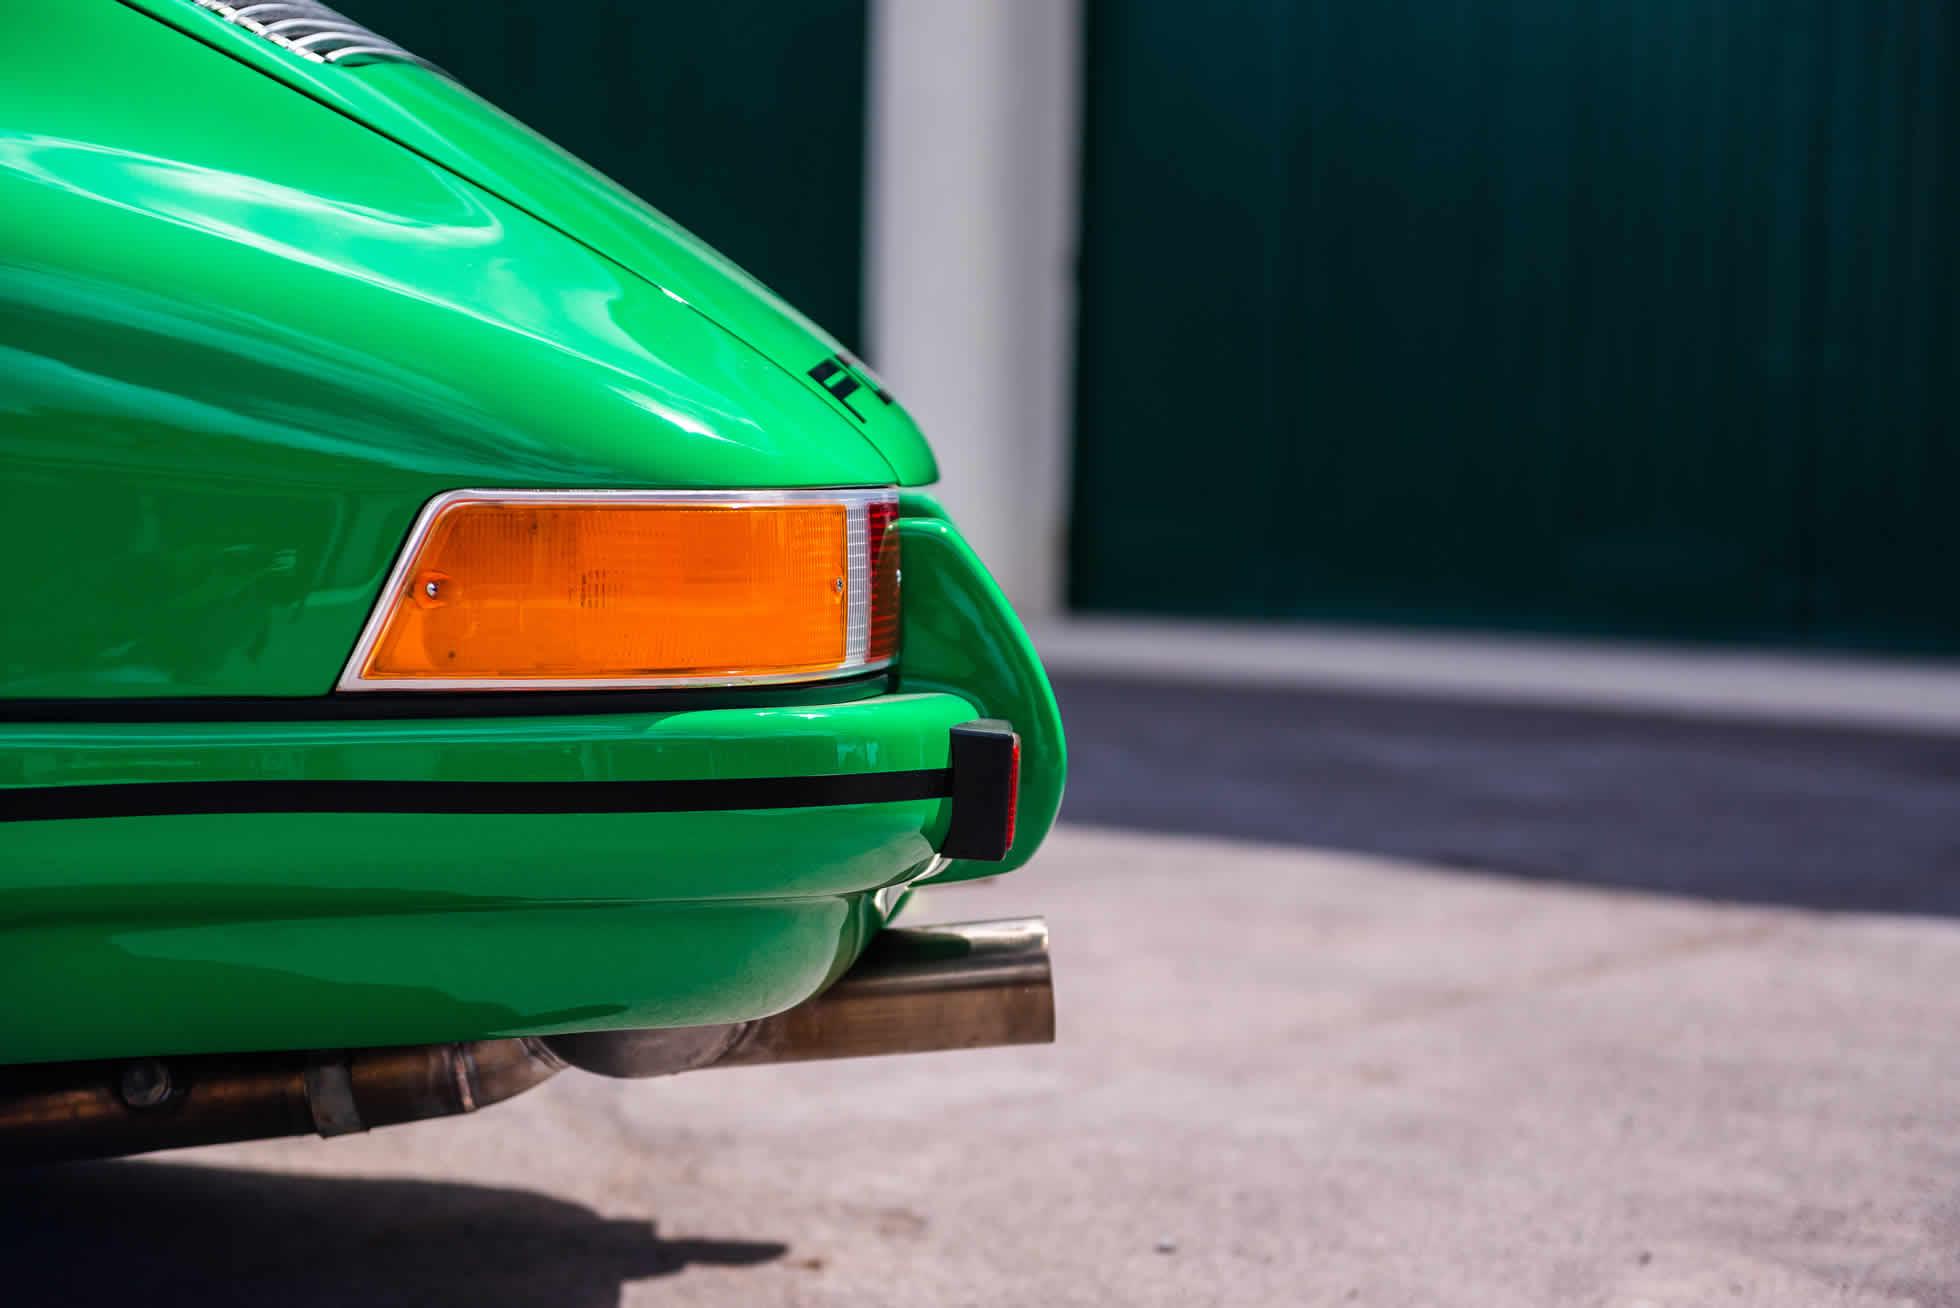 For Sale 1971 Porsche 911 S-T rear side view